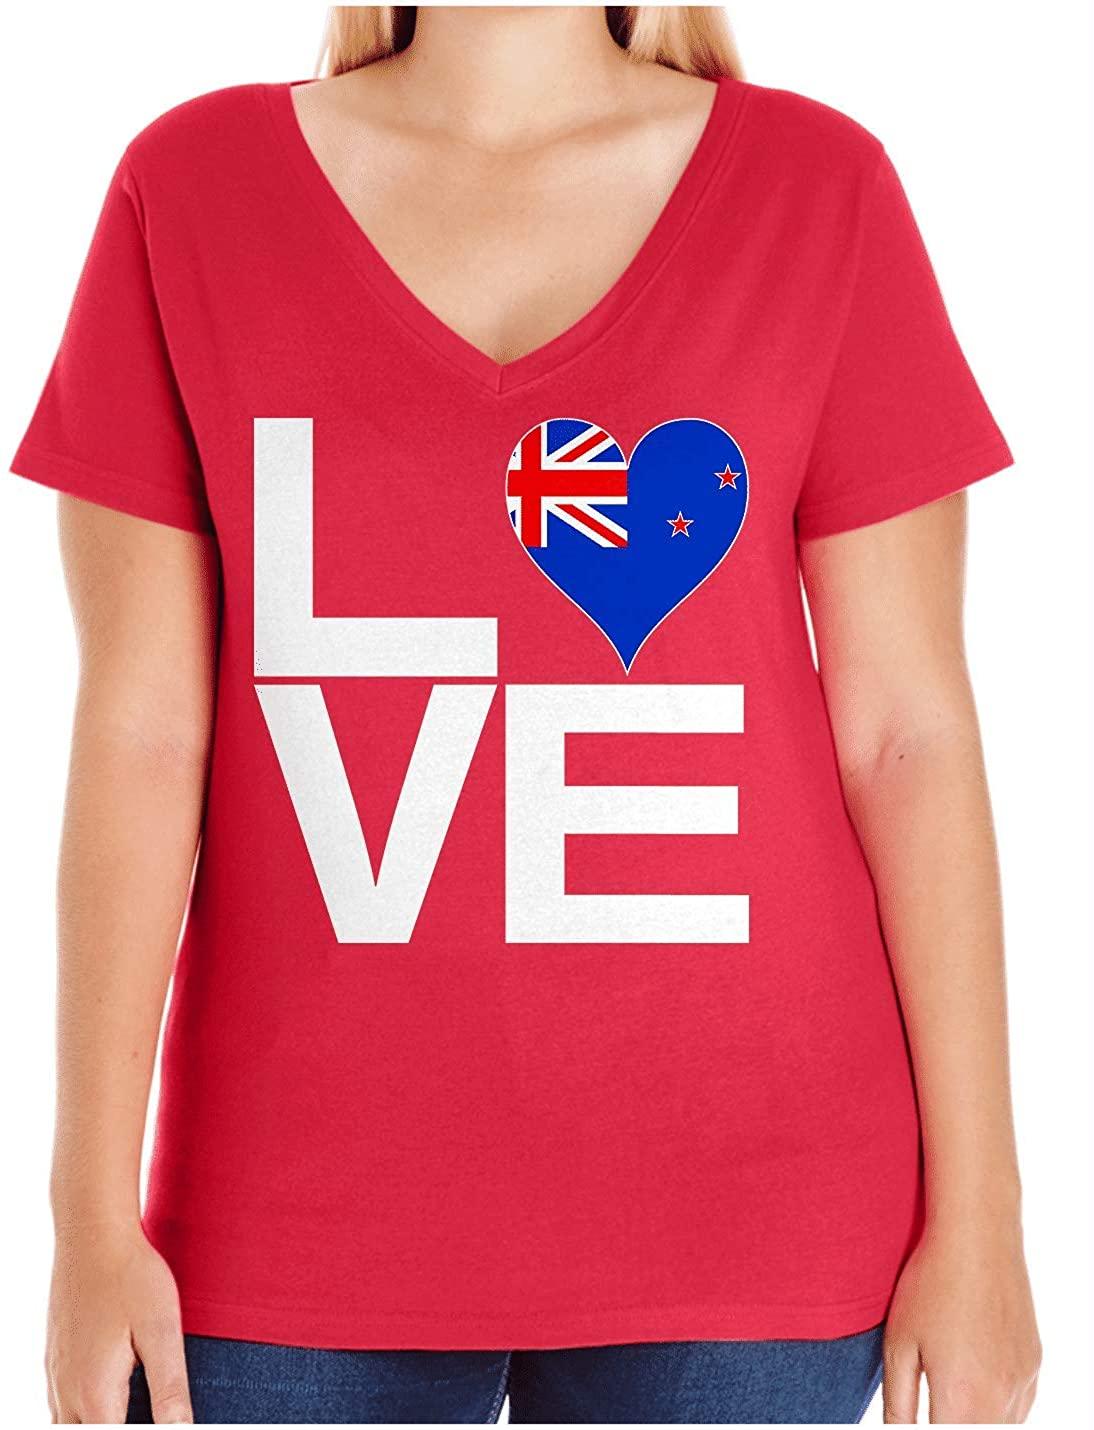 HARD EDGE DESIGN Women's Love Block New Zealand Heart Plus Size V Neck T-Shirt, Size 1, Red